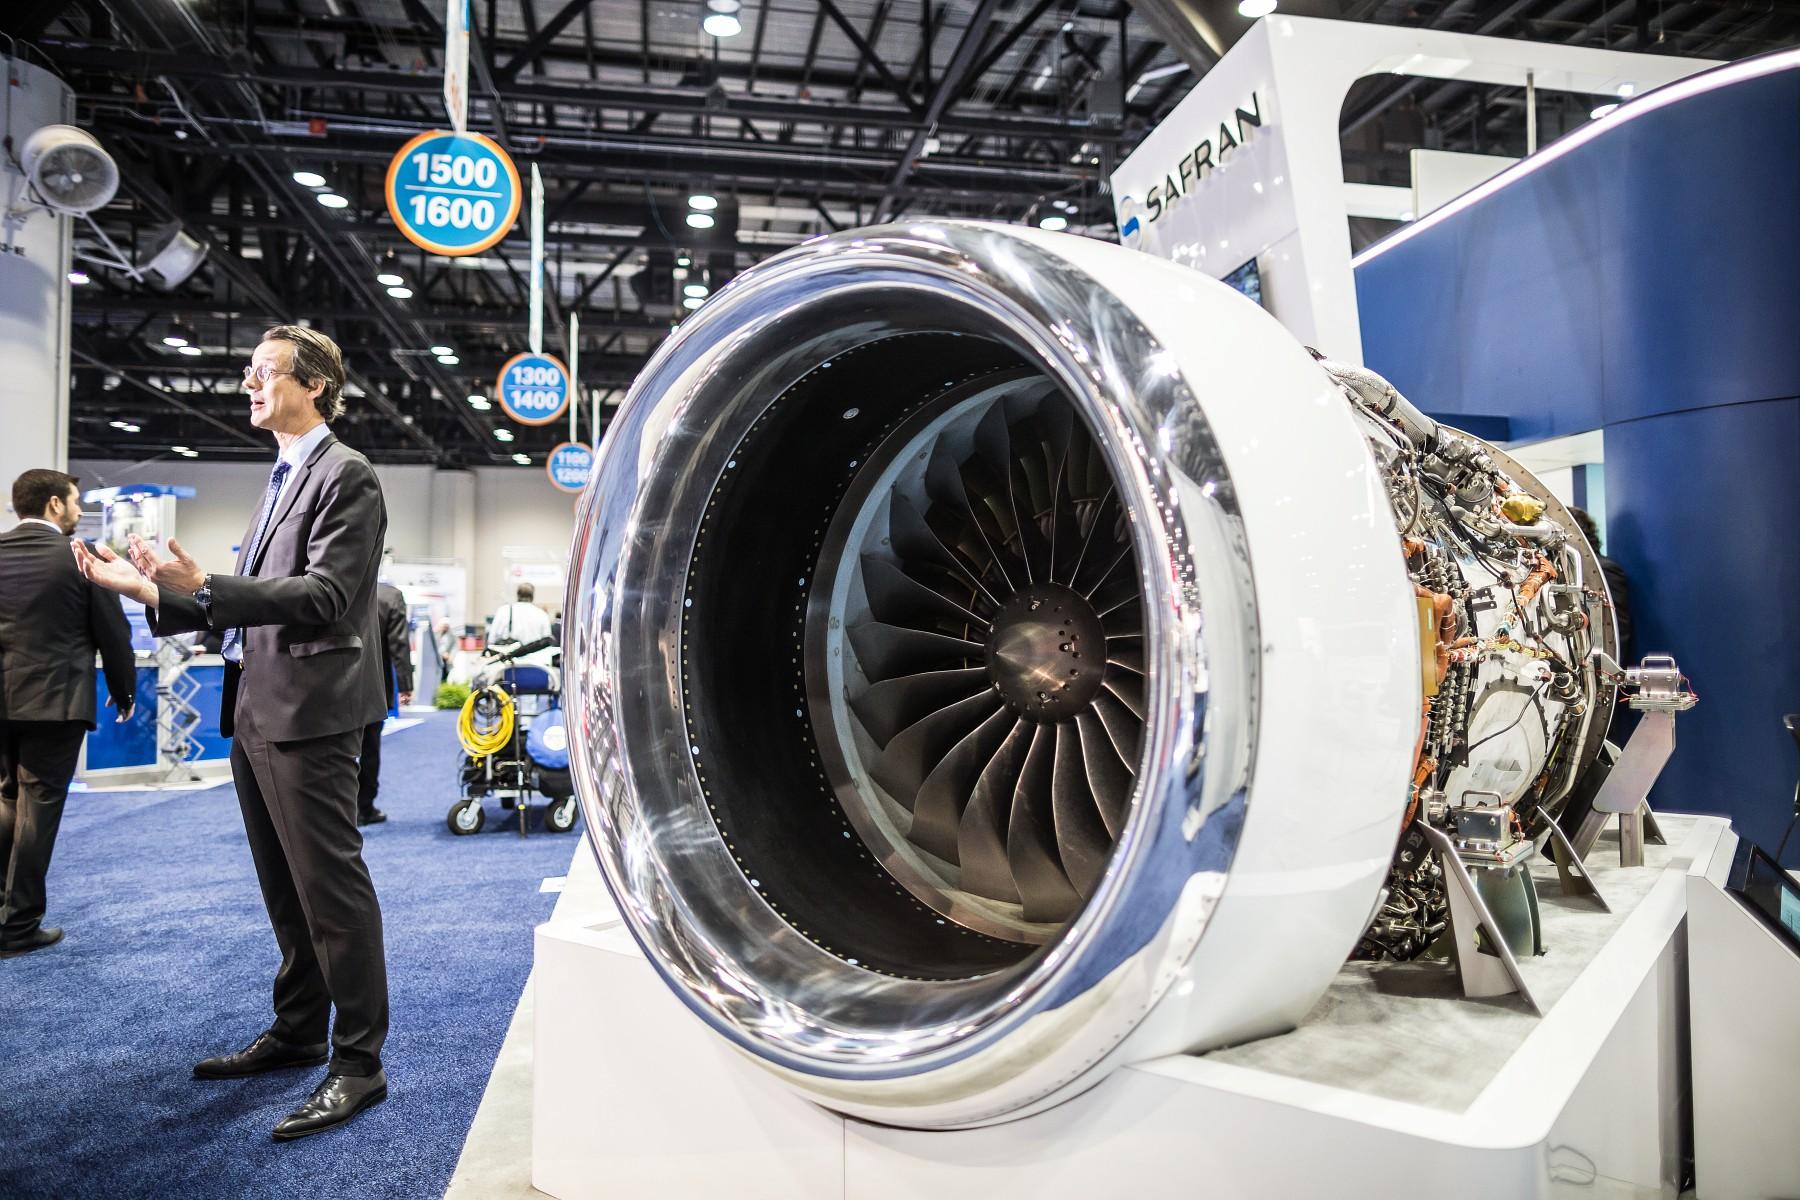 safran aircraft engines talent